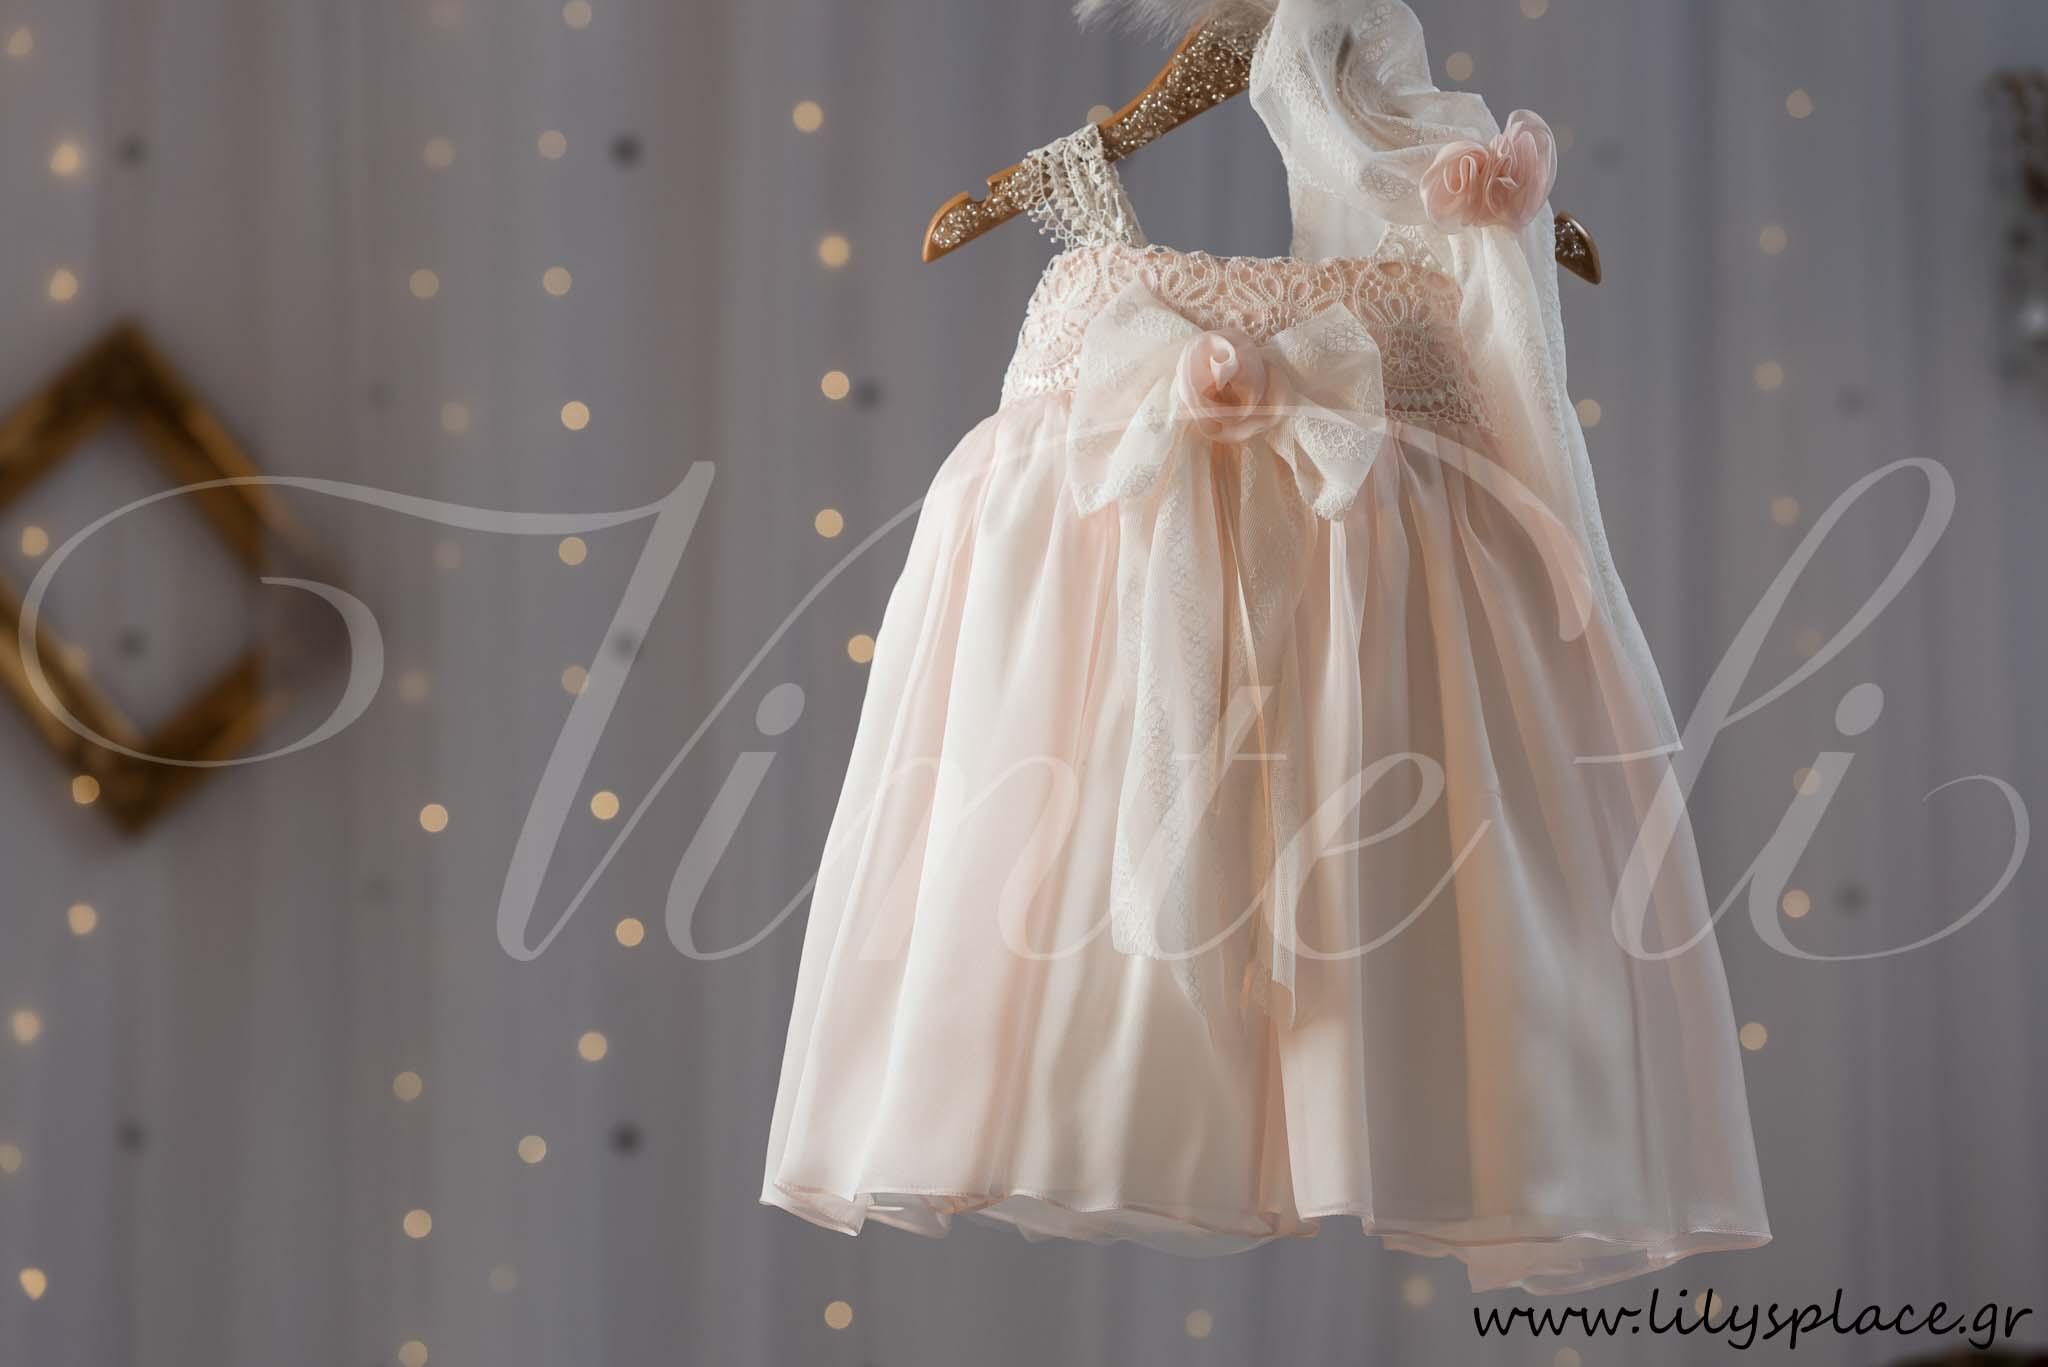 a2b4a97d9f18 Φόρεμα βάπτισης με δαντέλα Vinte li